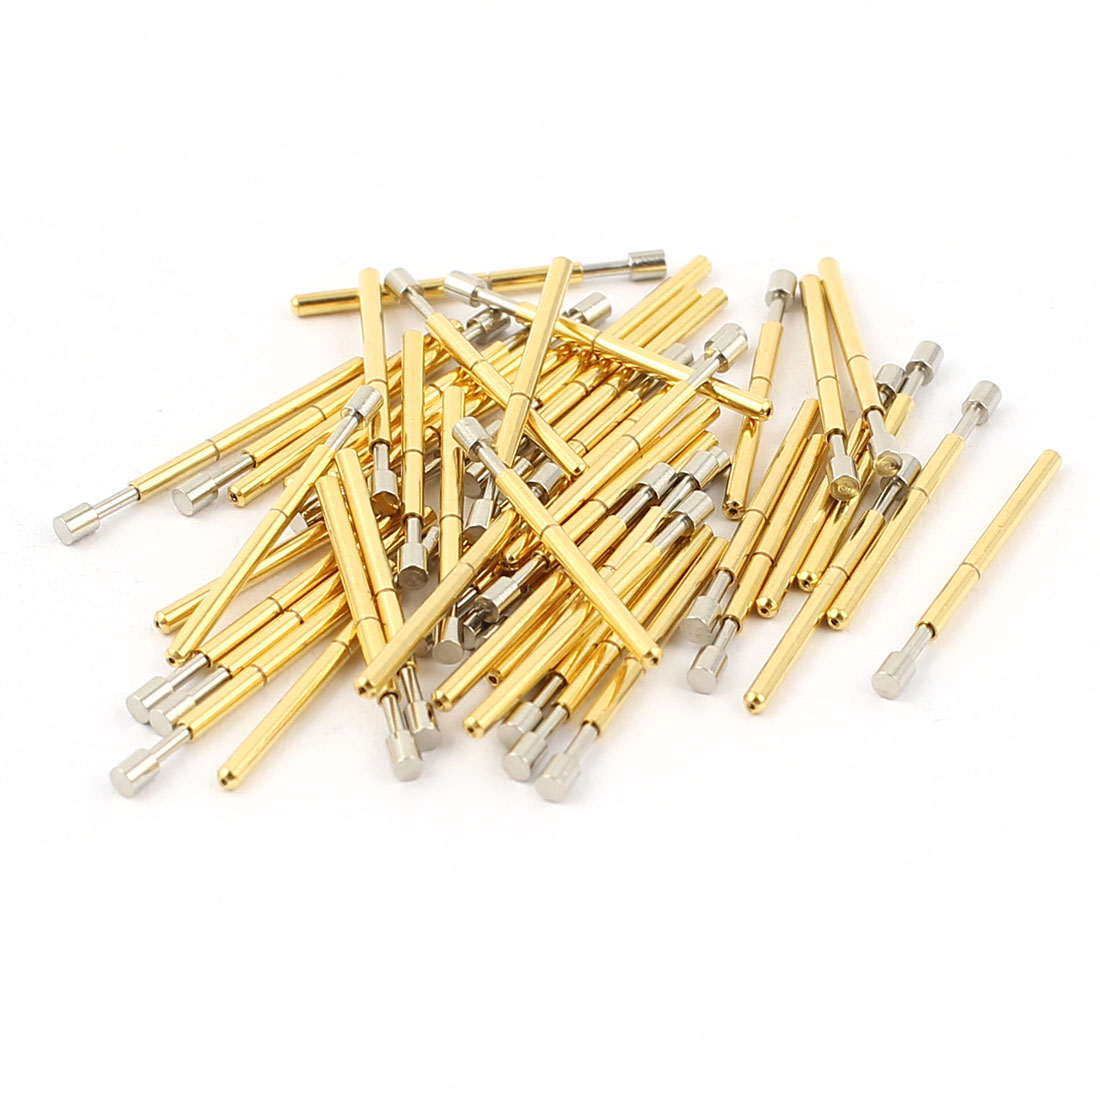 50 Pcs P75-G 1.3mm Flat Tip 16.5mm Length Spring Testing Probes Pin